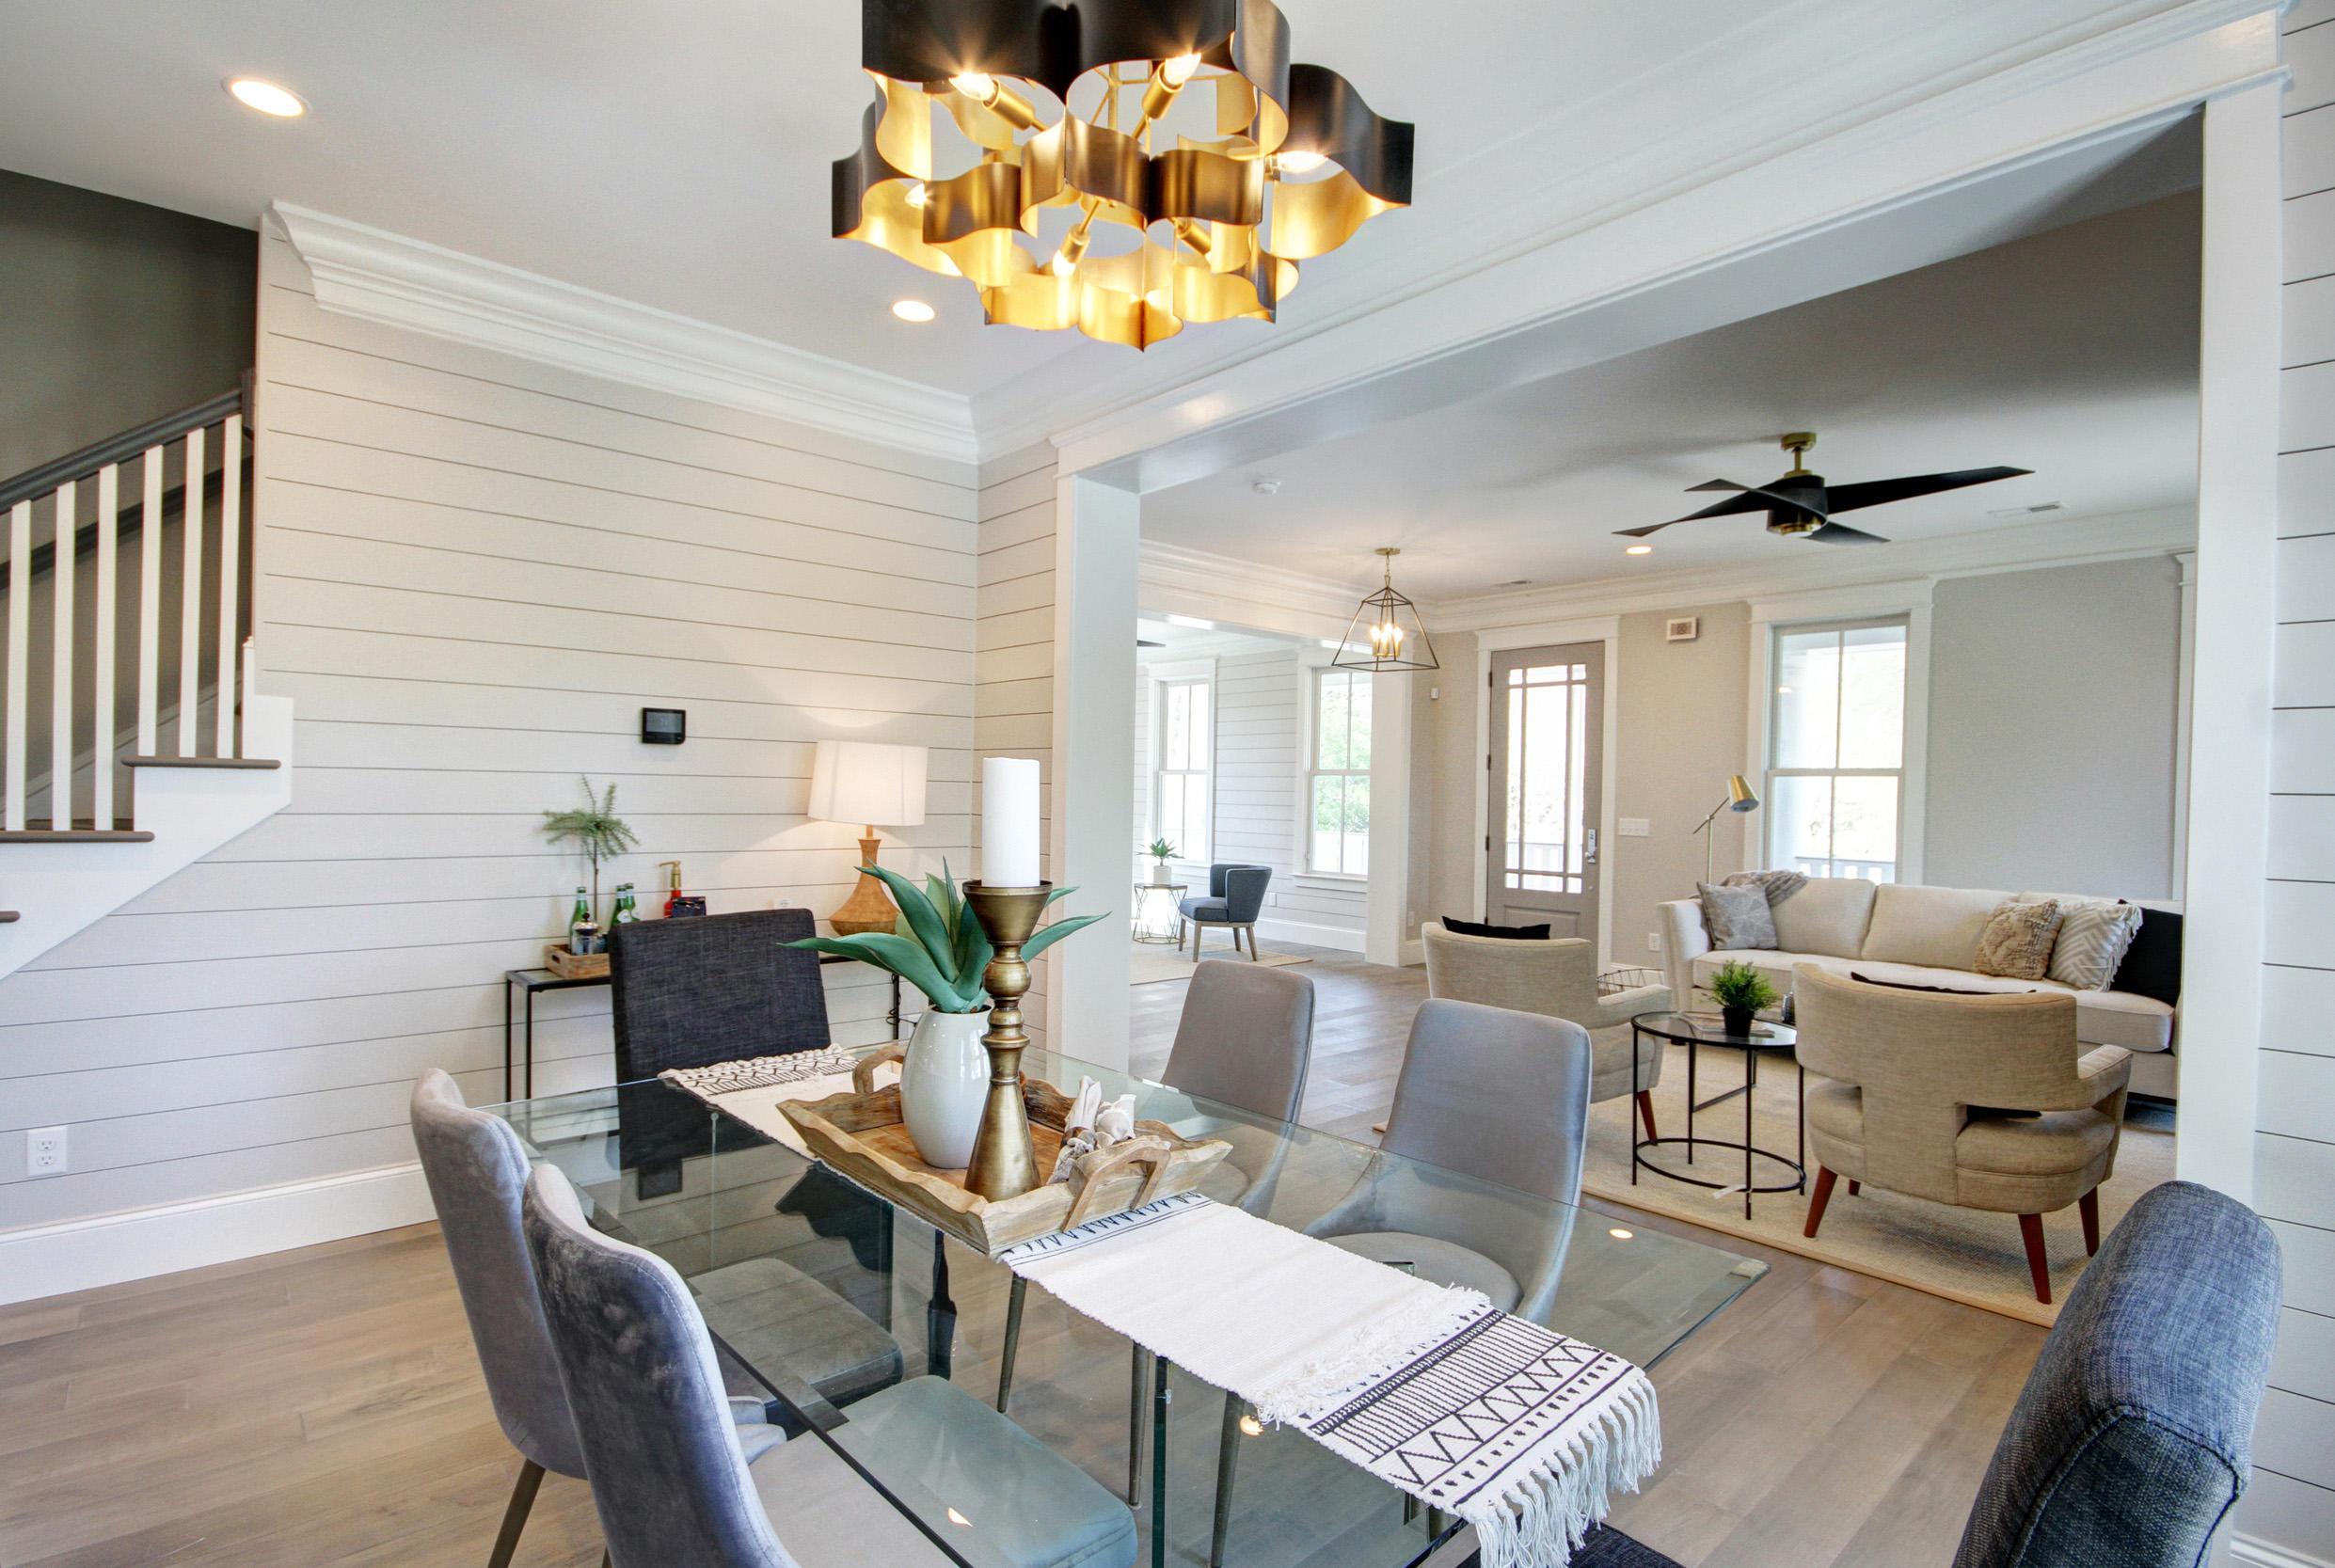 Mathis Ferry Court Homes For Sale - 1212 Clonmel Place, Mount Pleasant, SC - 18